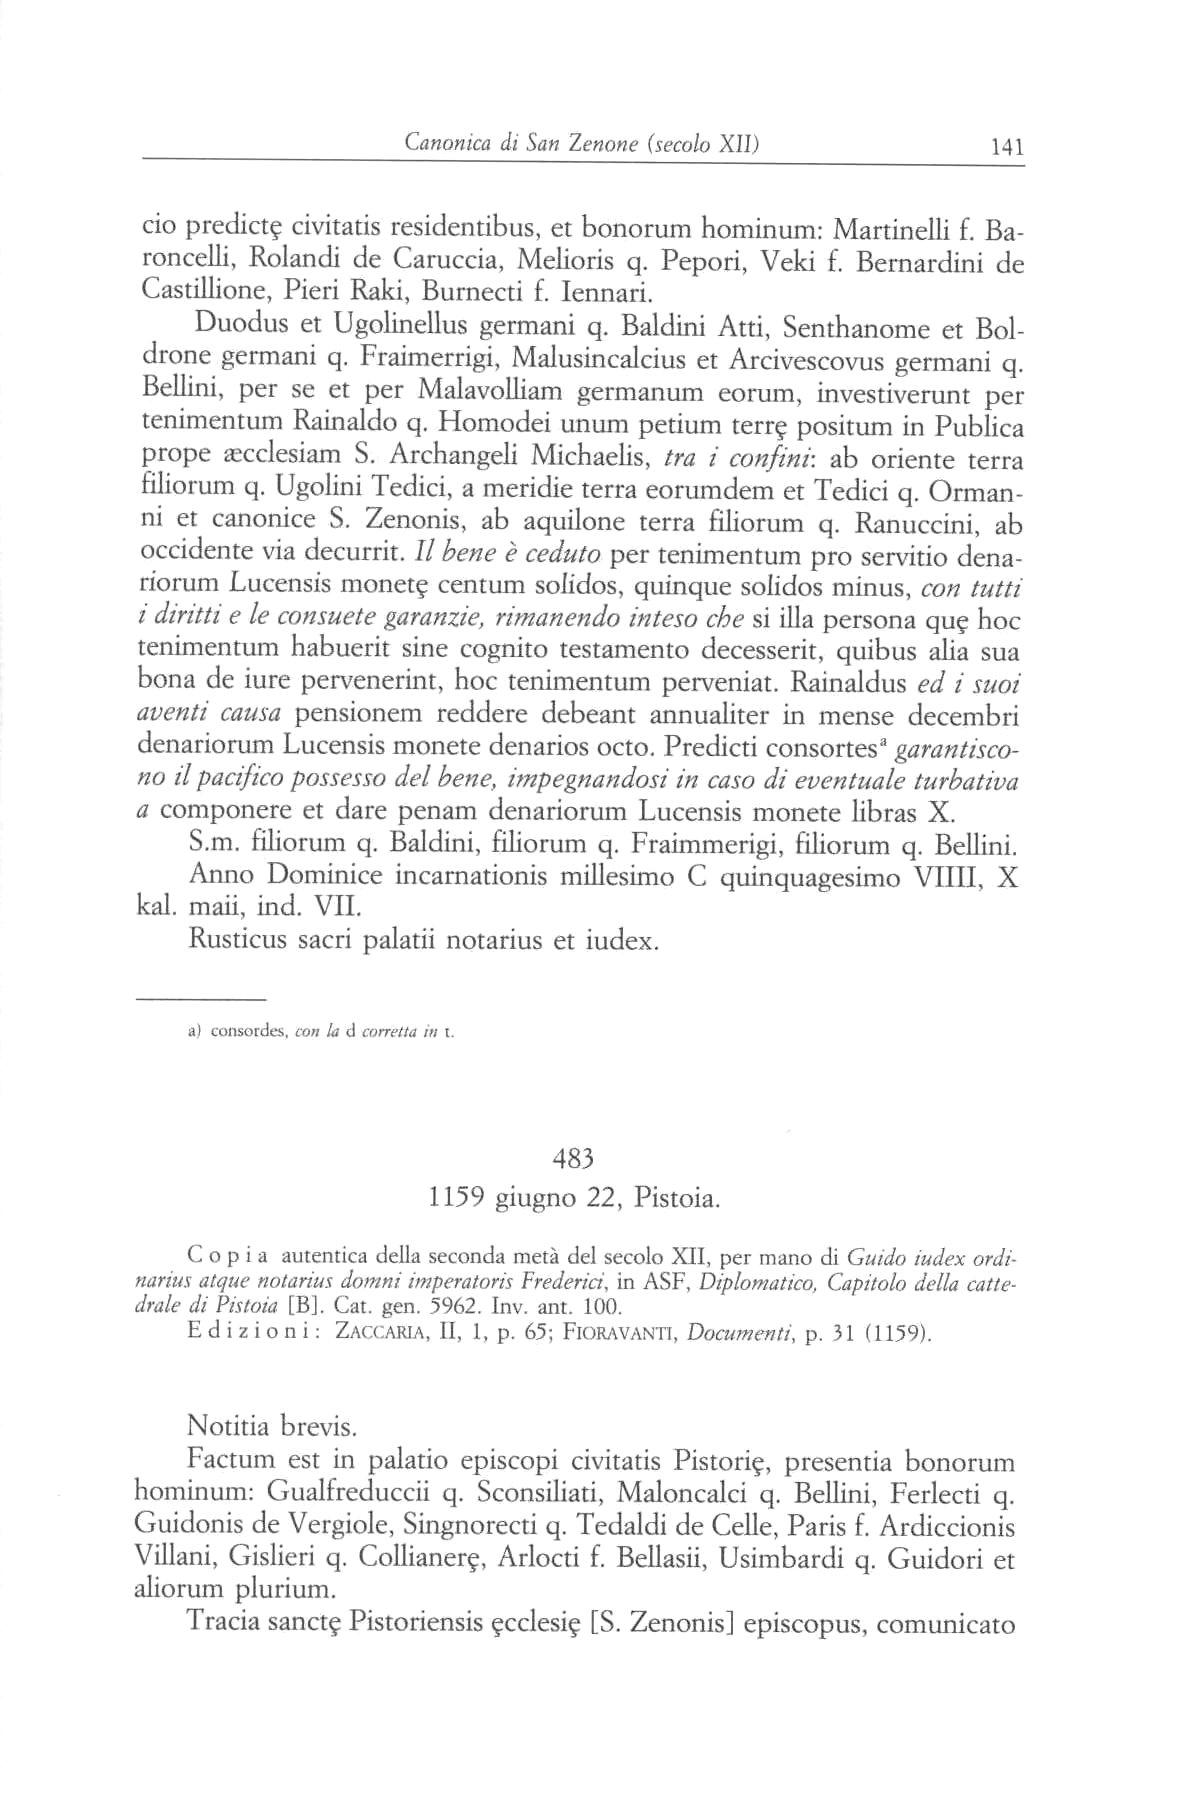 Canonica S. Zenone XII 0141.jpg